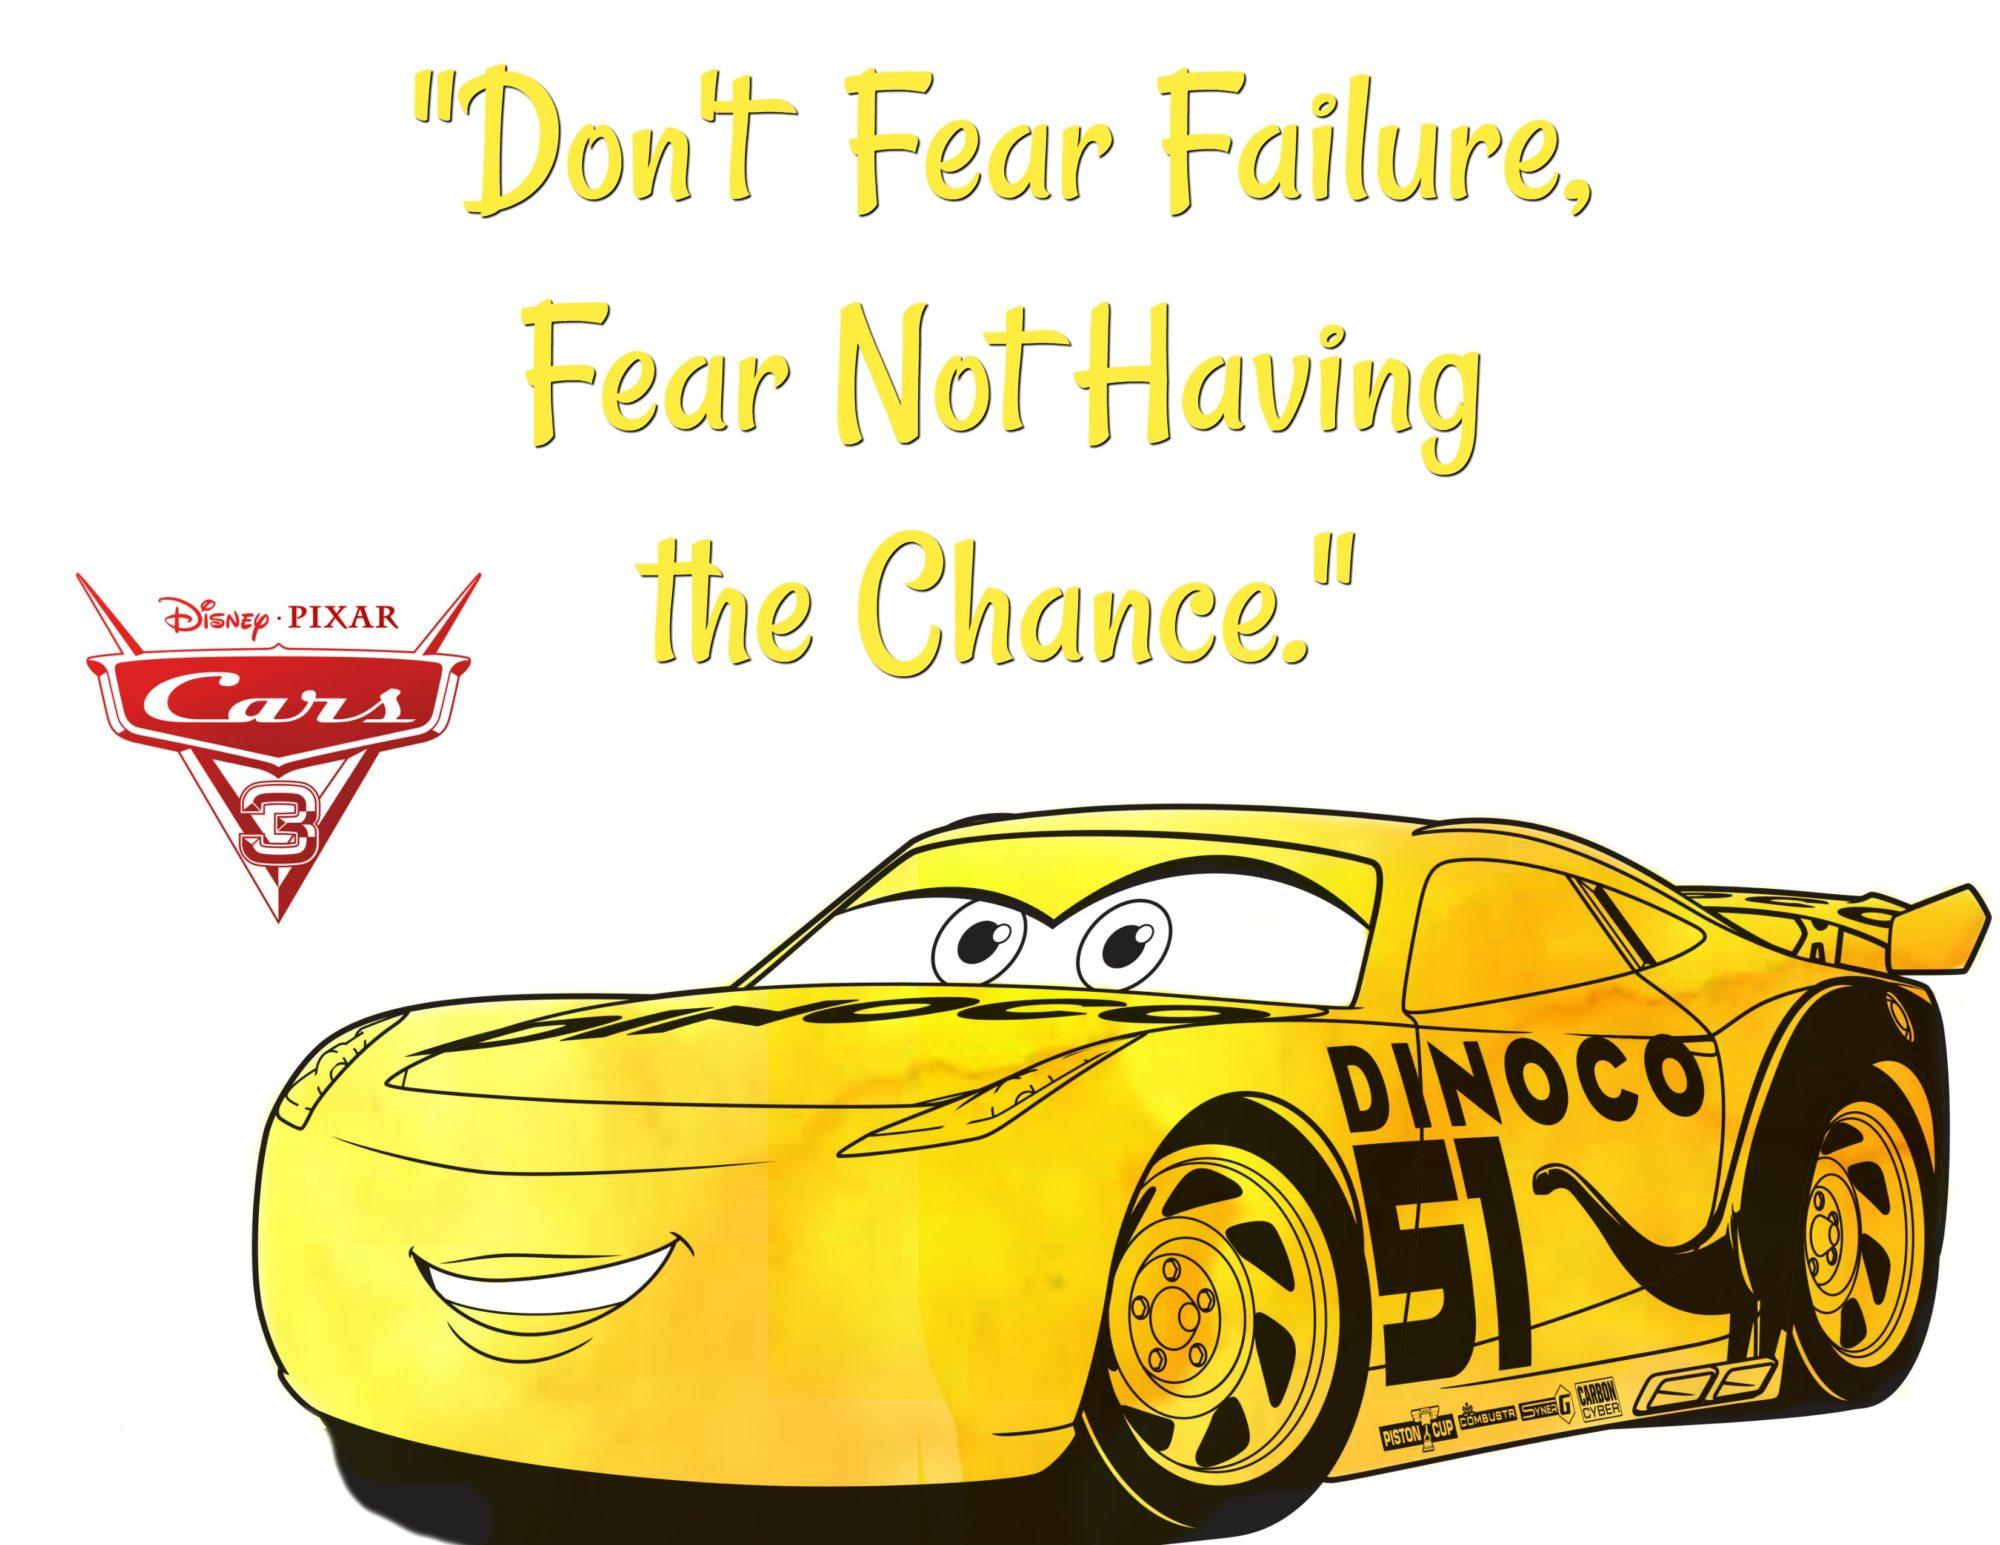 disney pixar cars quote printable pixarfest life family joy